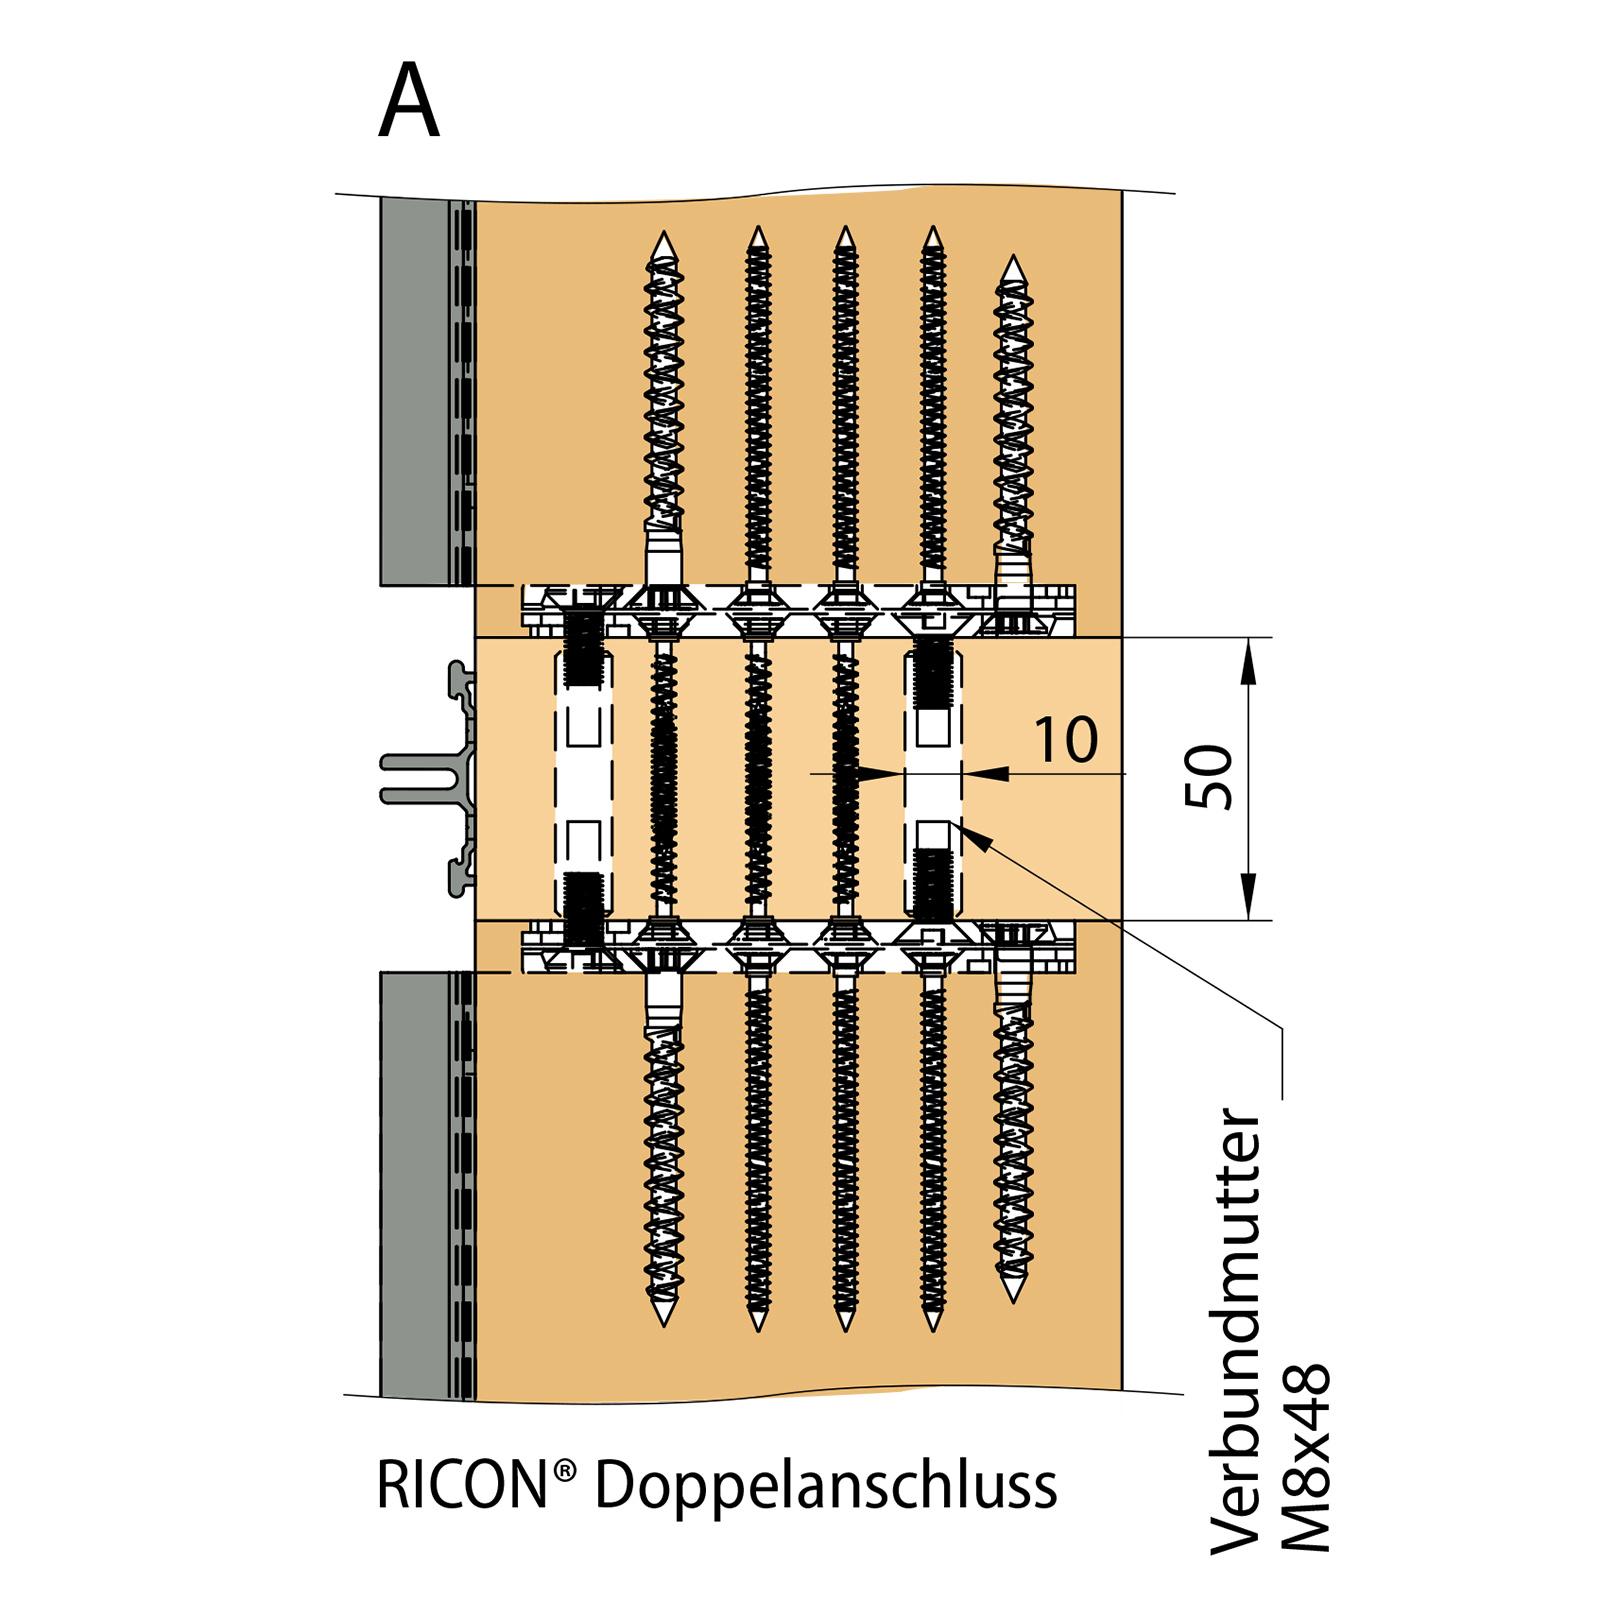 ricon circuit board wiring diagram ricon   system double connection  da  knapp   connectors  ricon   system double connection  da